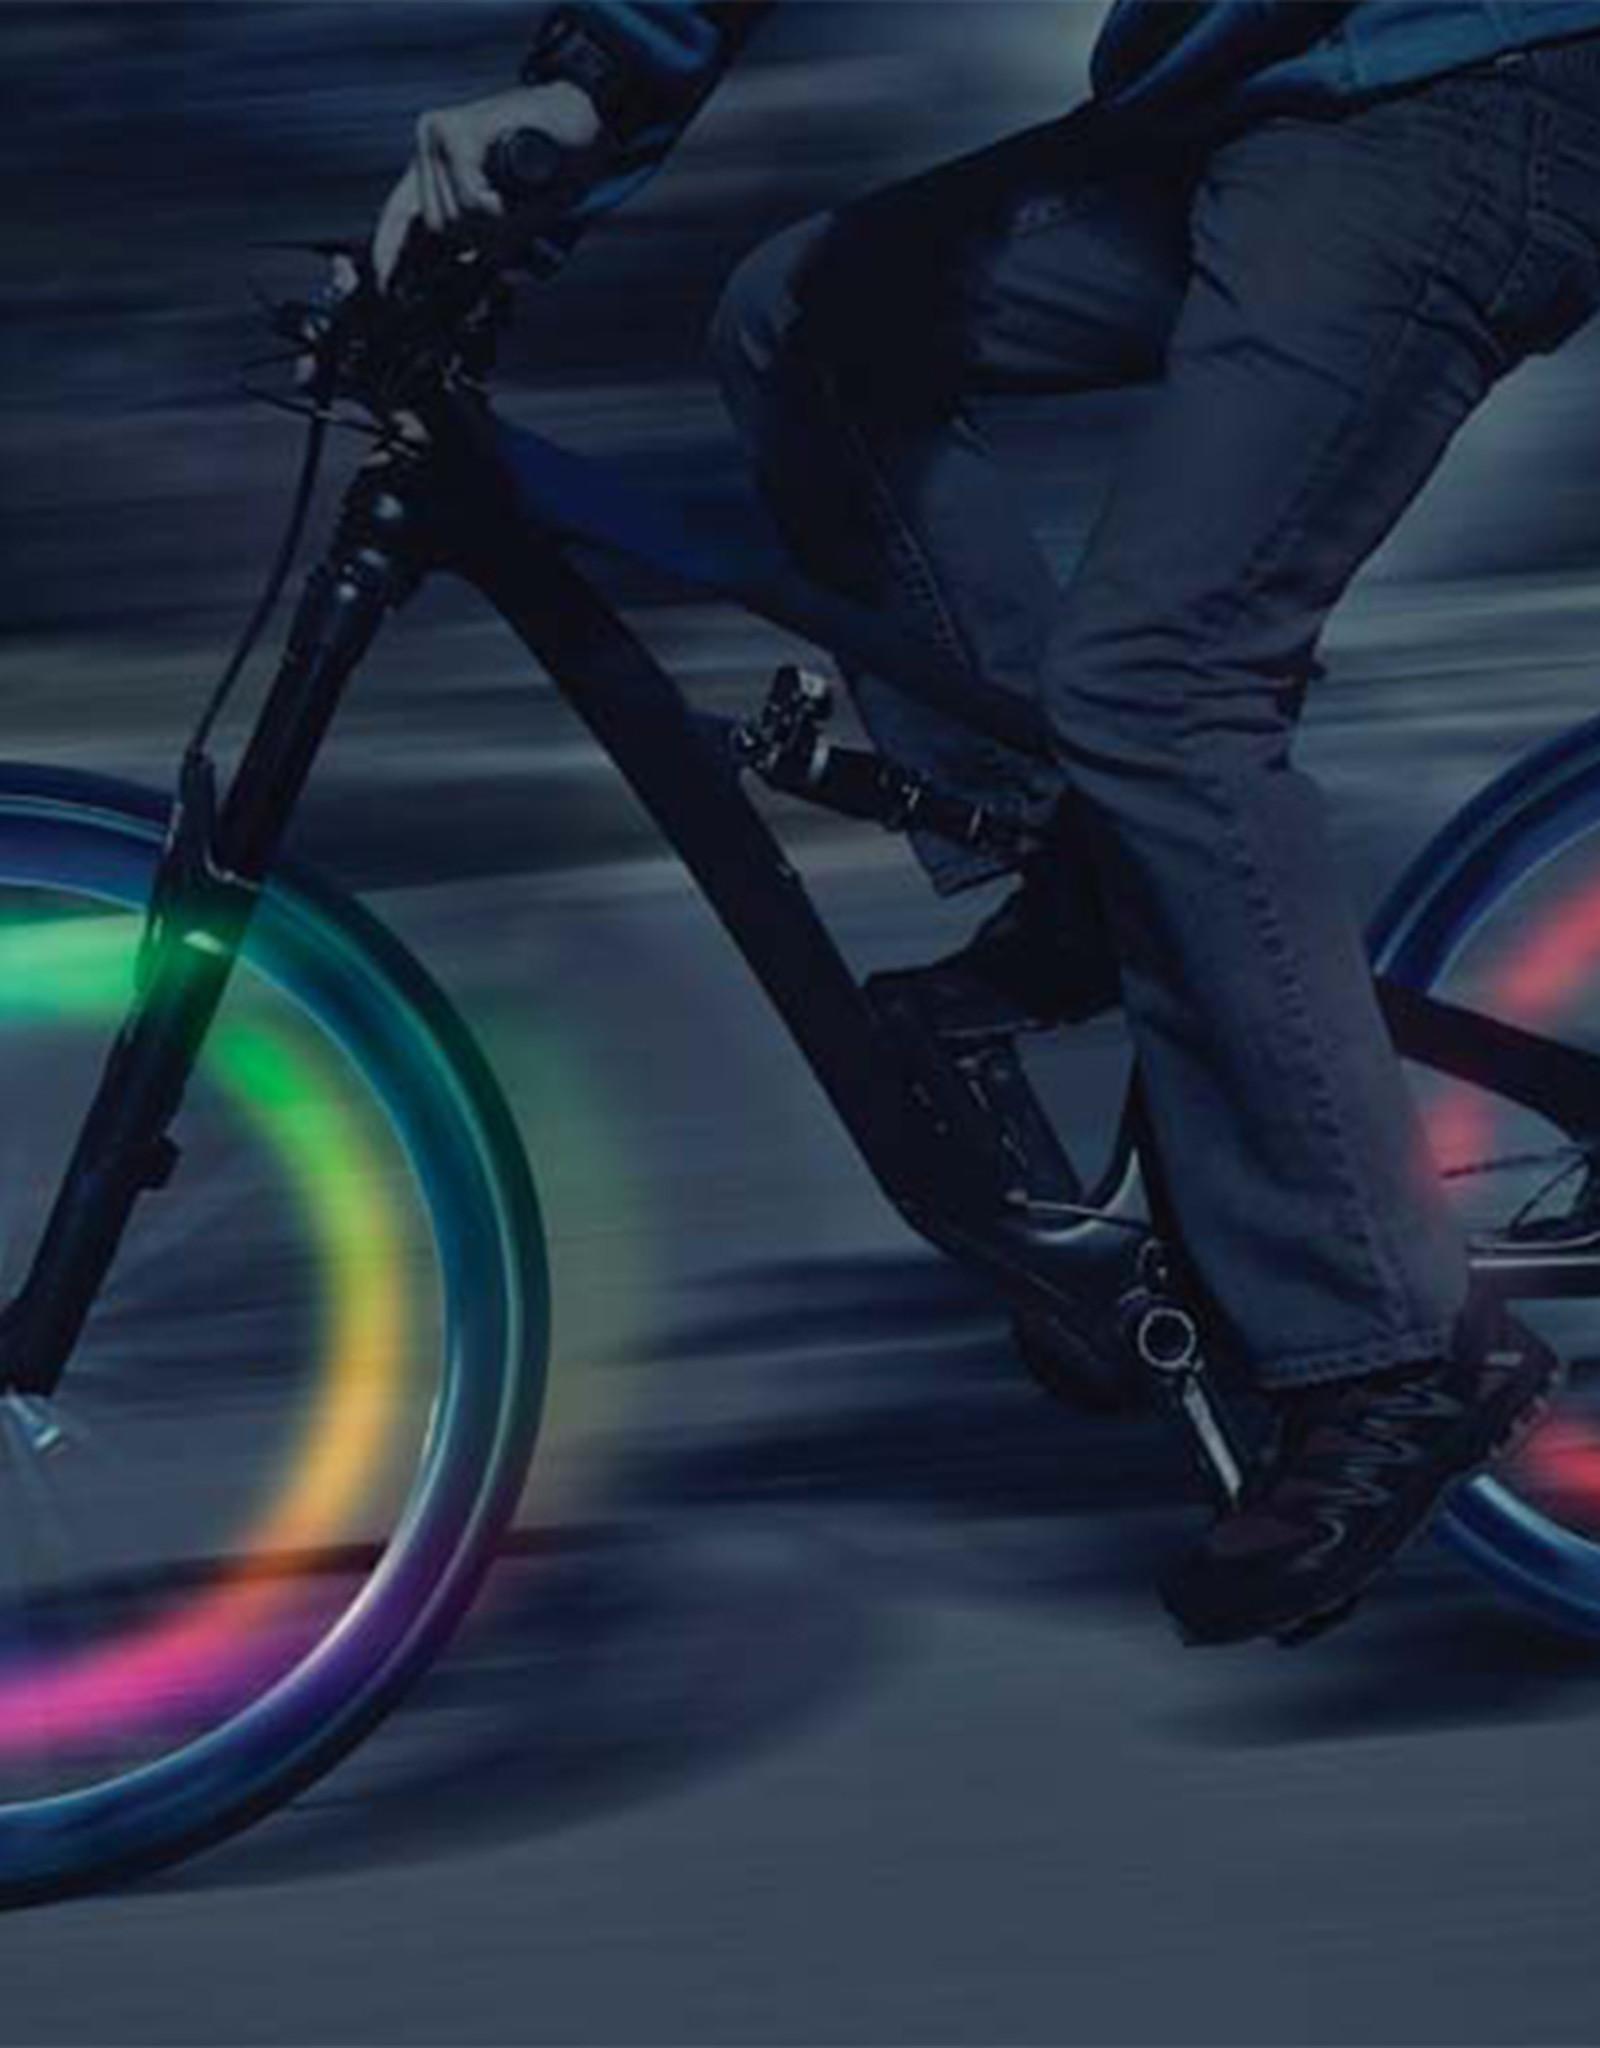 Nite Ize SpokeLit Disc-O Multi-Color LED Light